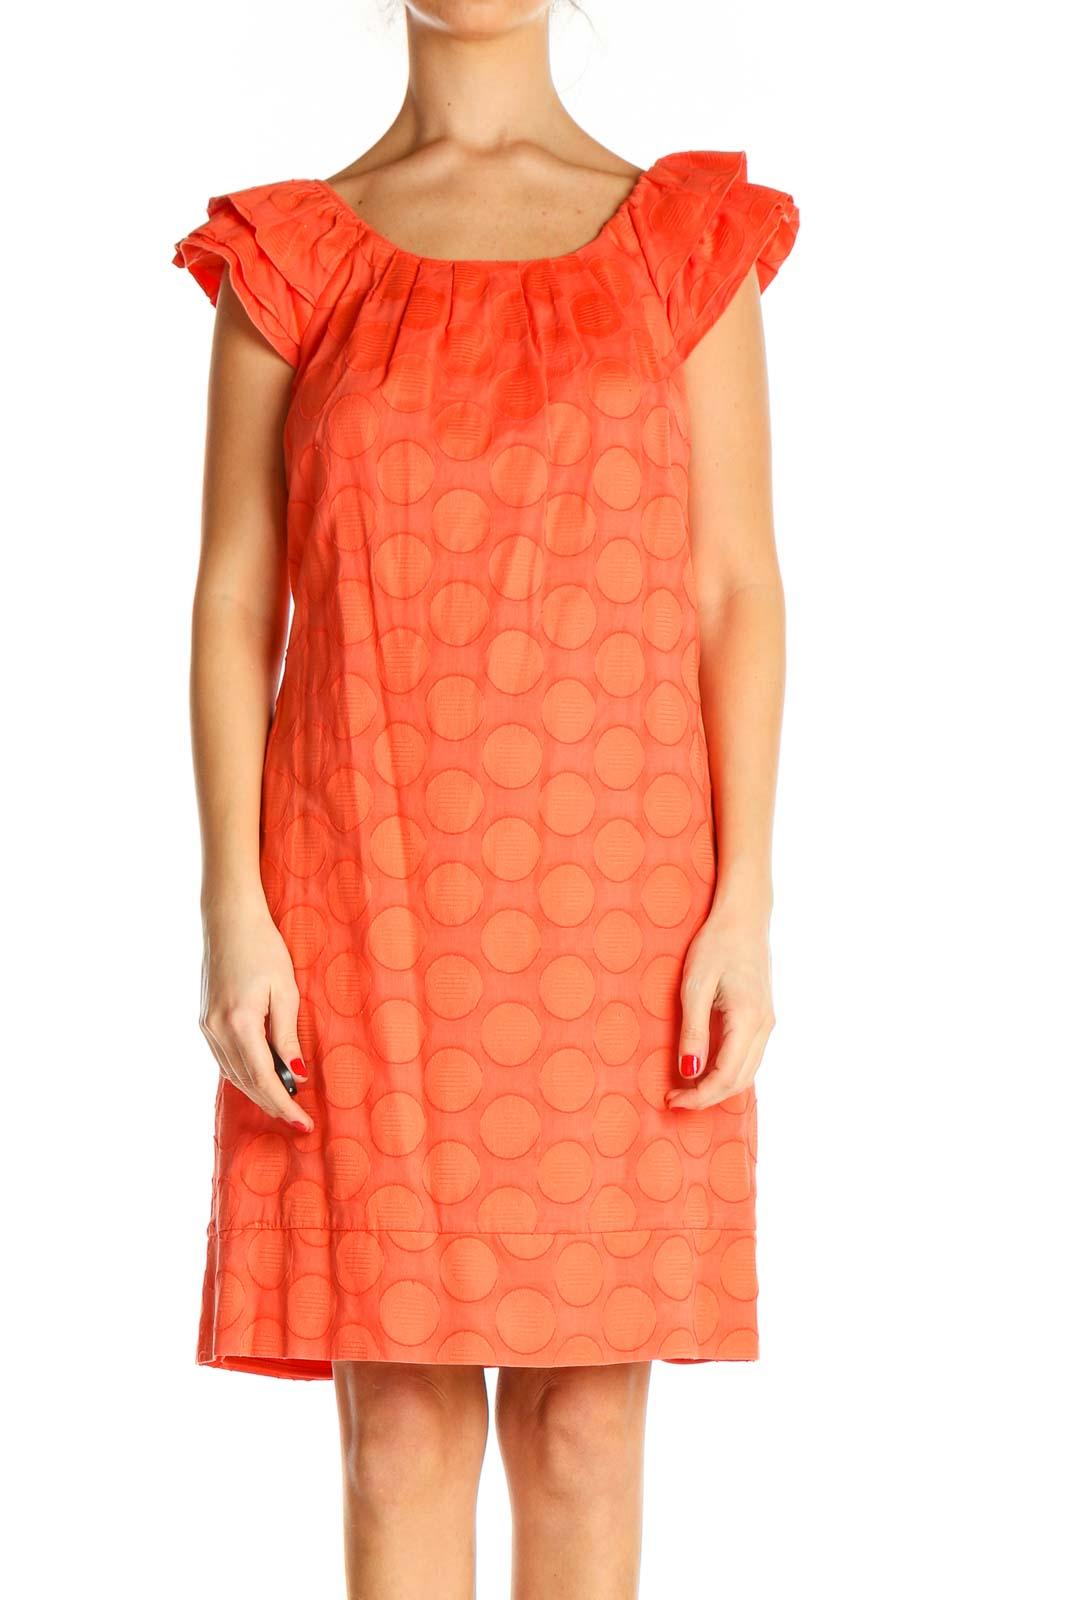 Orange Printed Retro Shift Dress Front